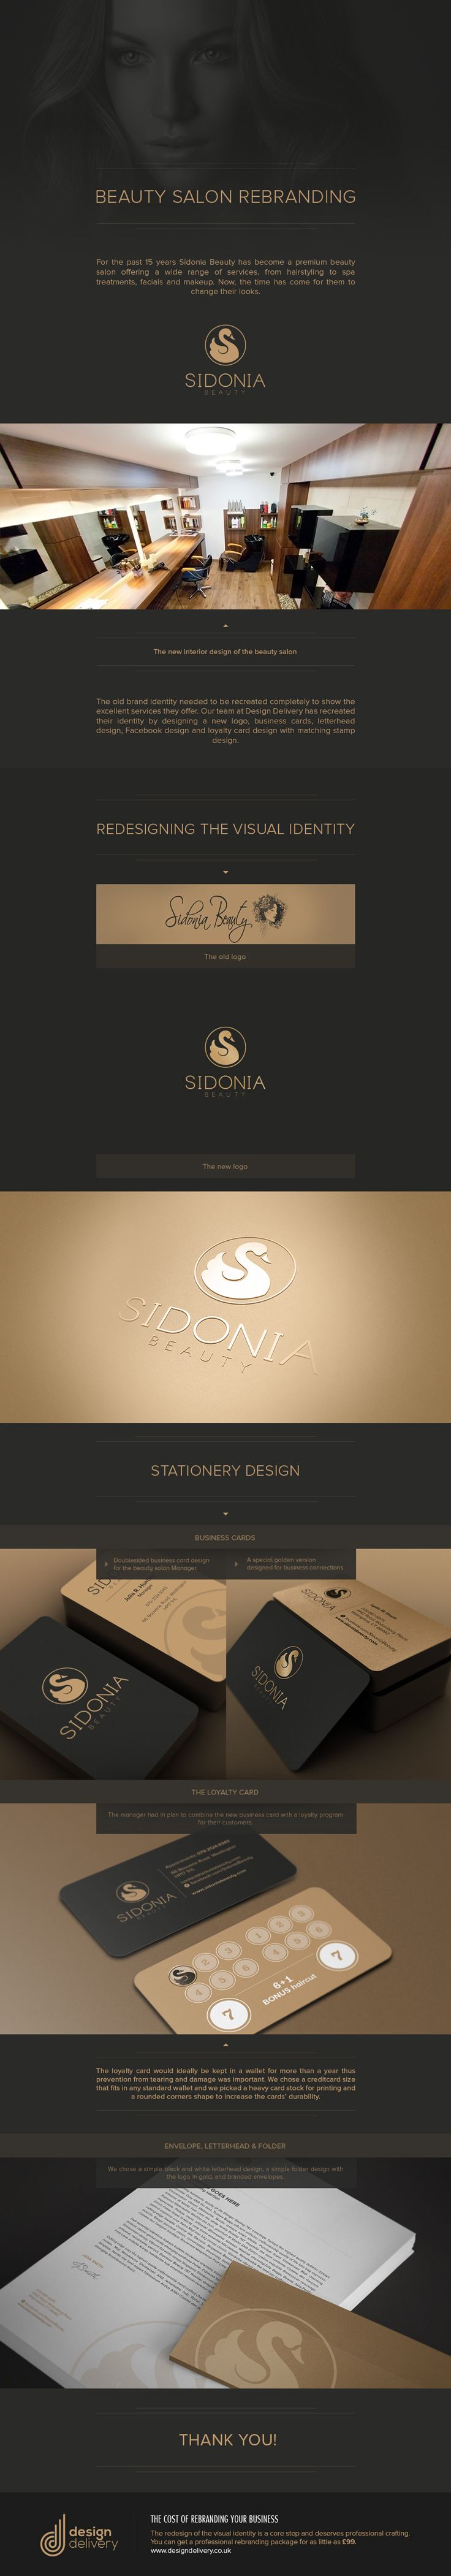 Beauty Salon logo design on Behance